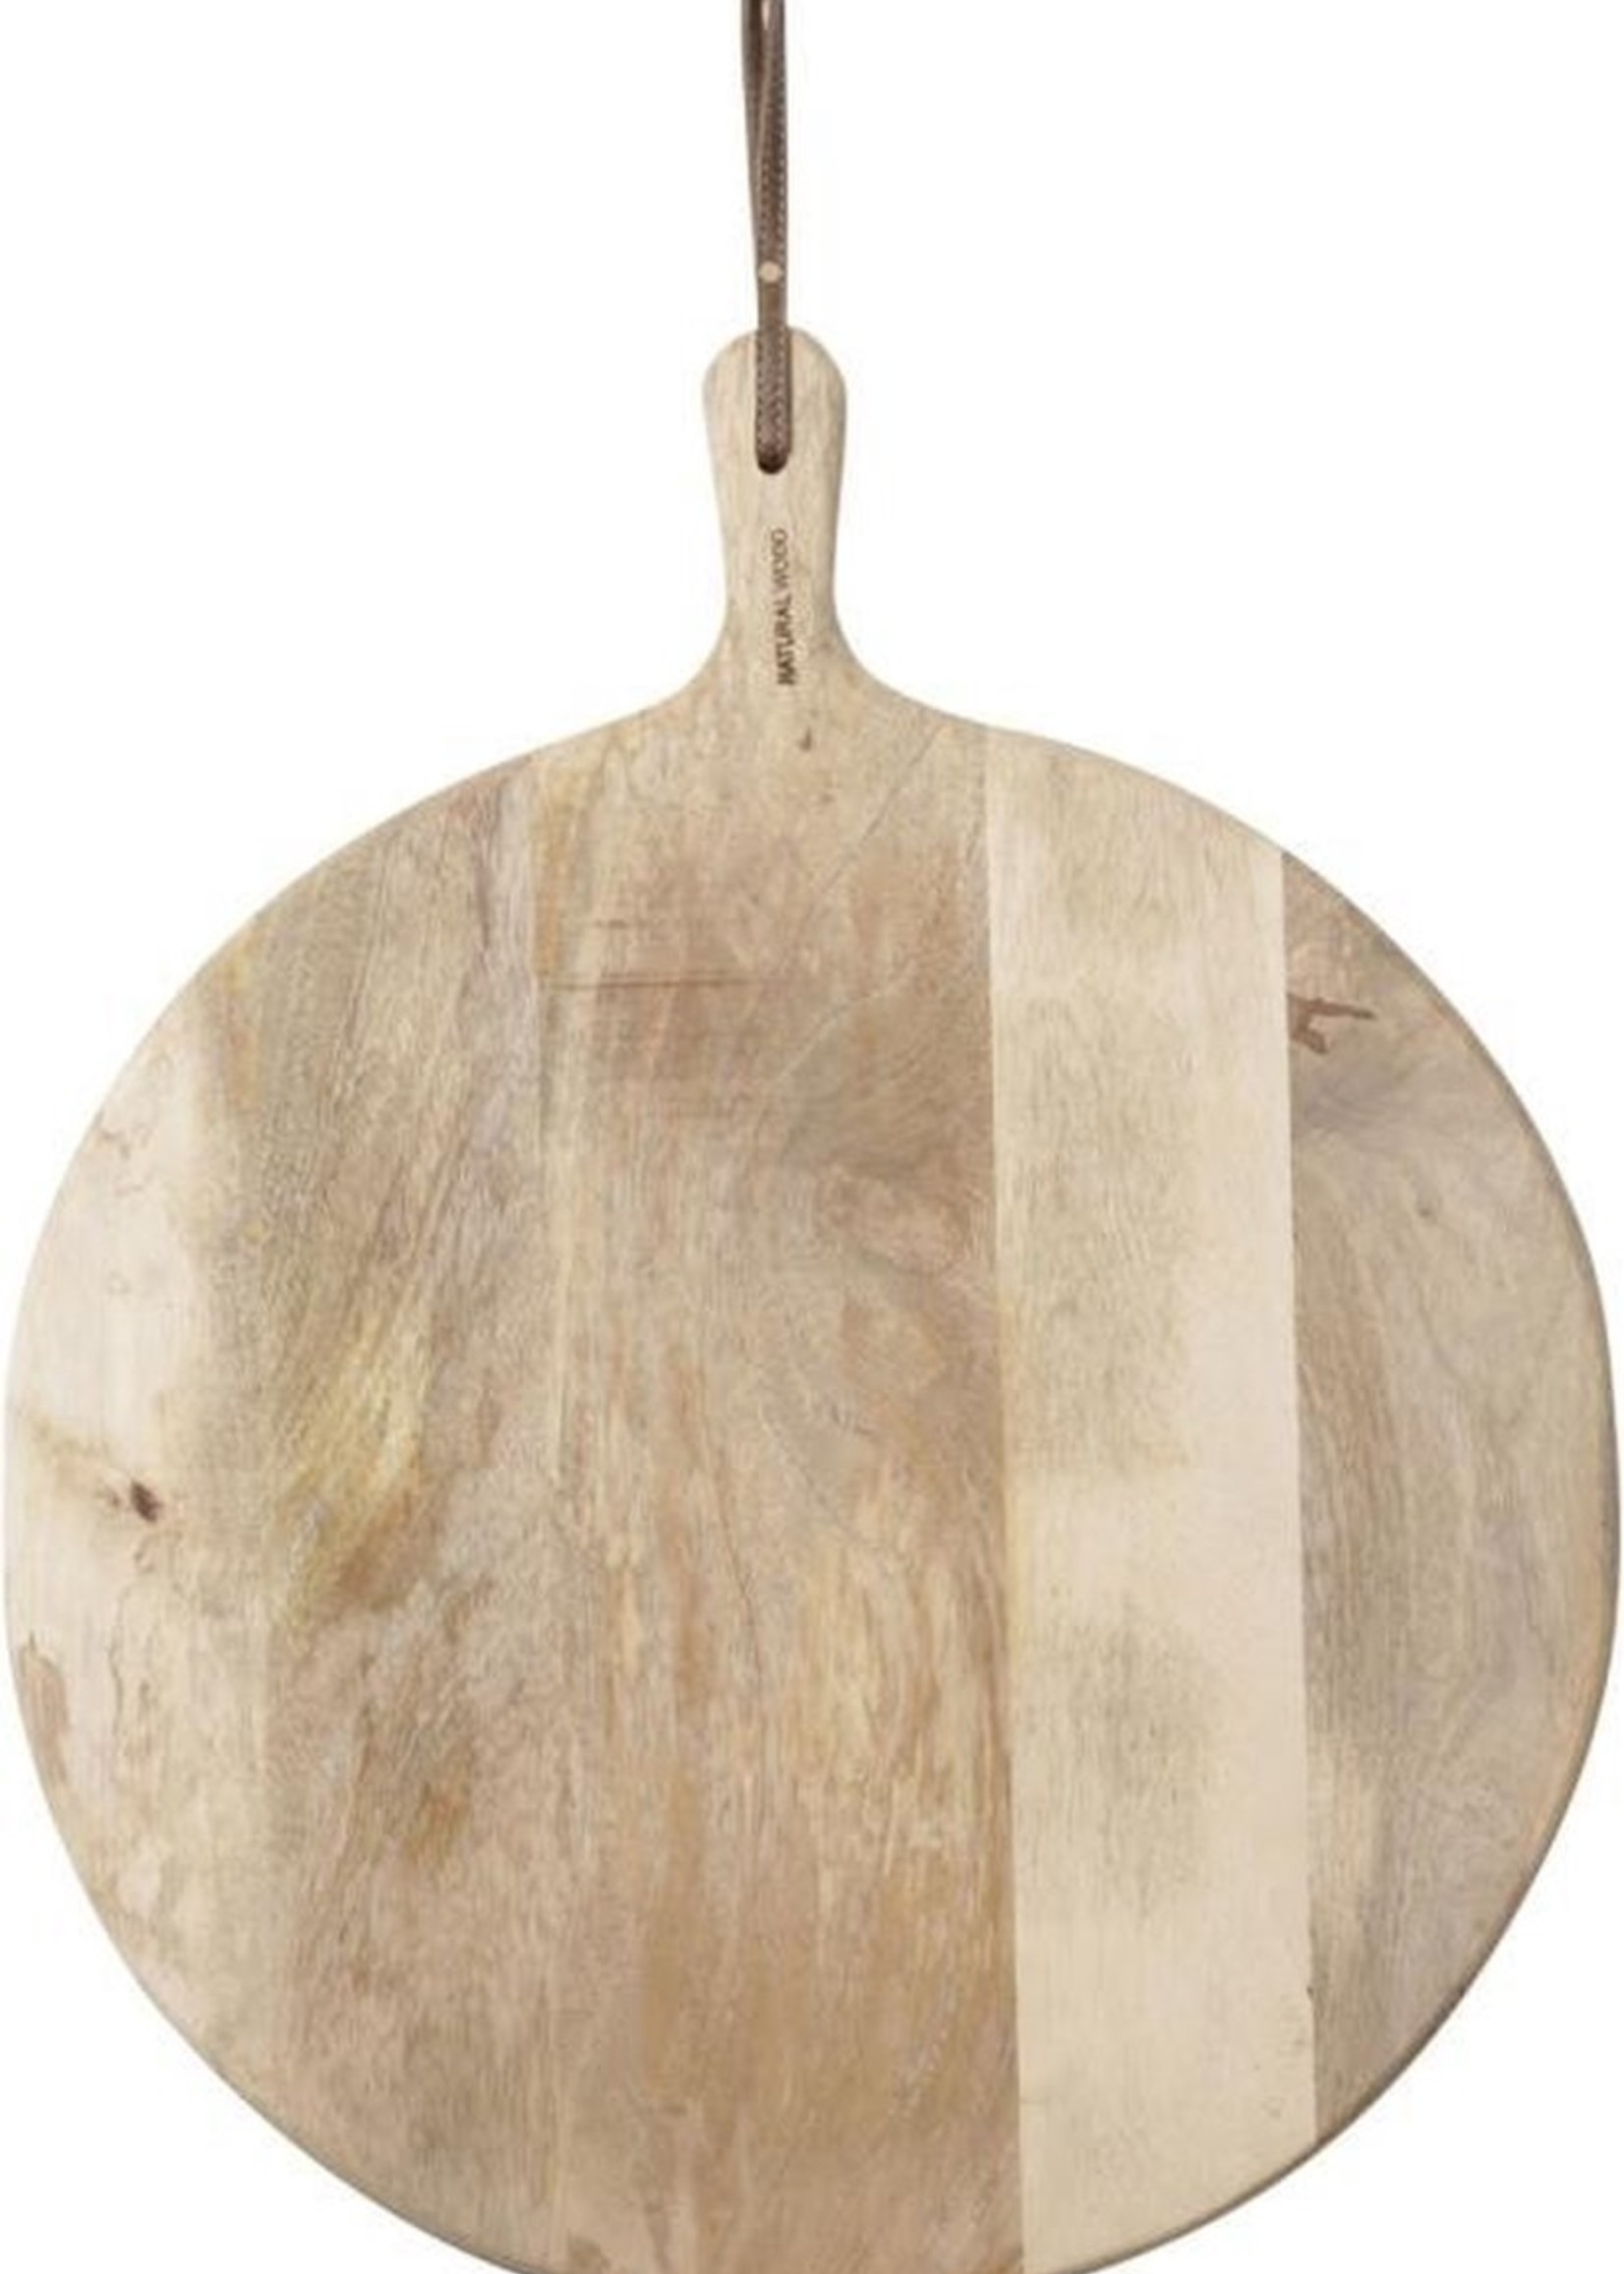 Rond tapas board